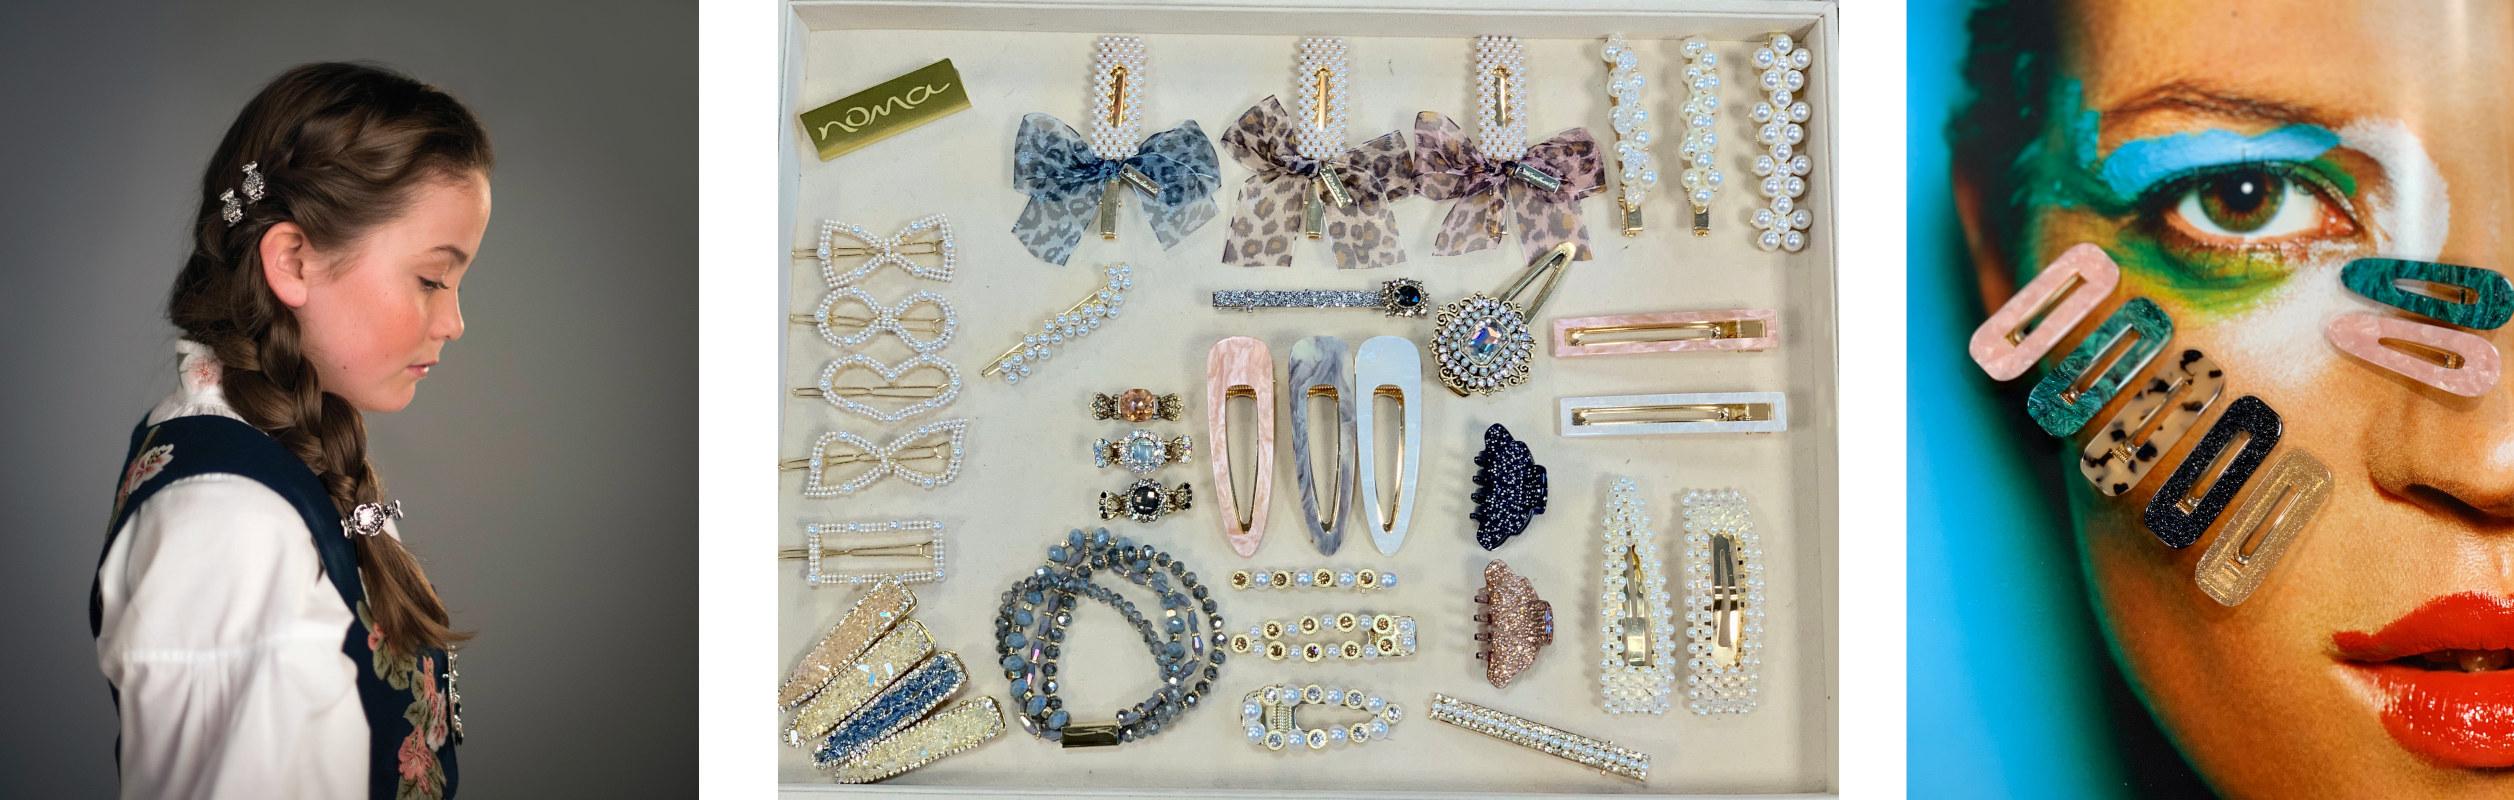 Scan Magazine NOMA 13 bunad NOMA 3 news NOMA 31 accessories